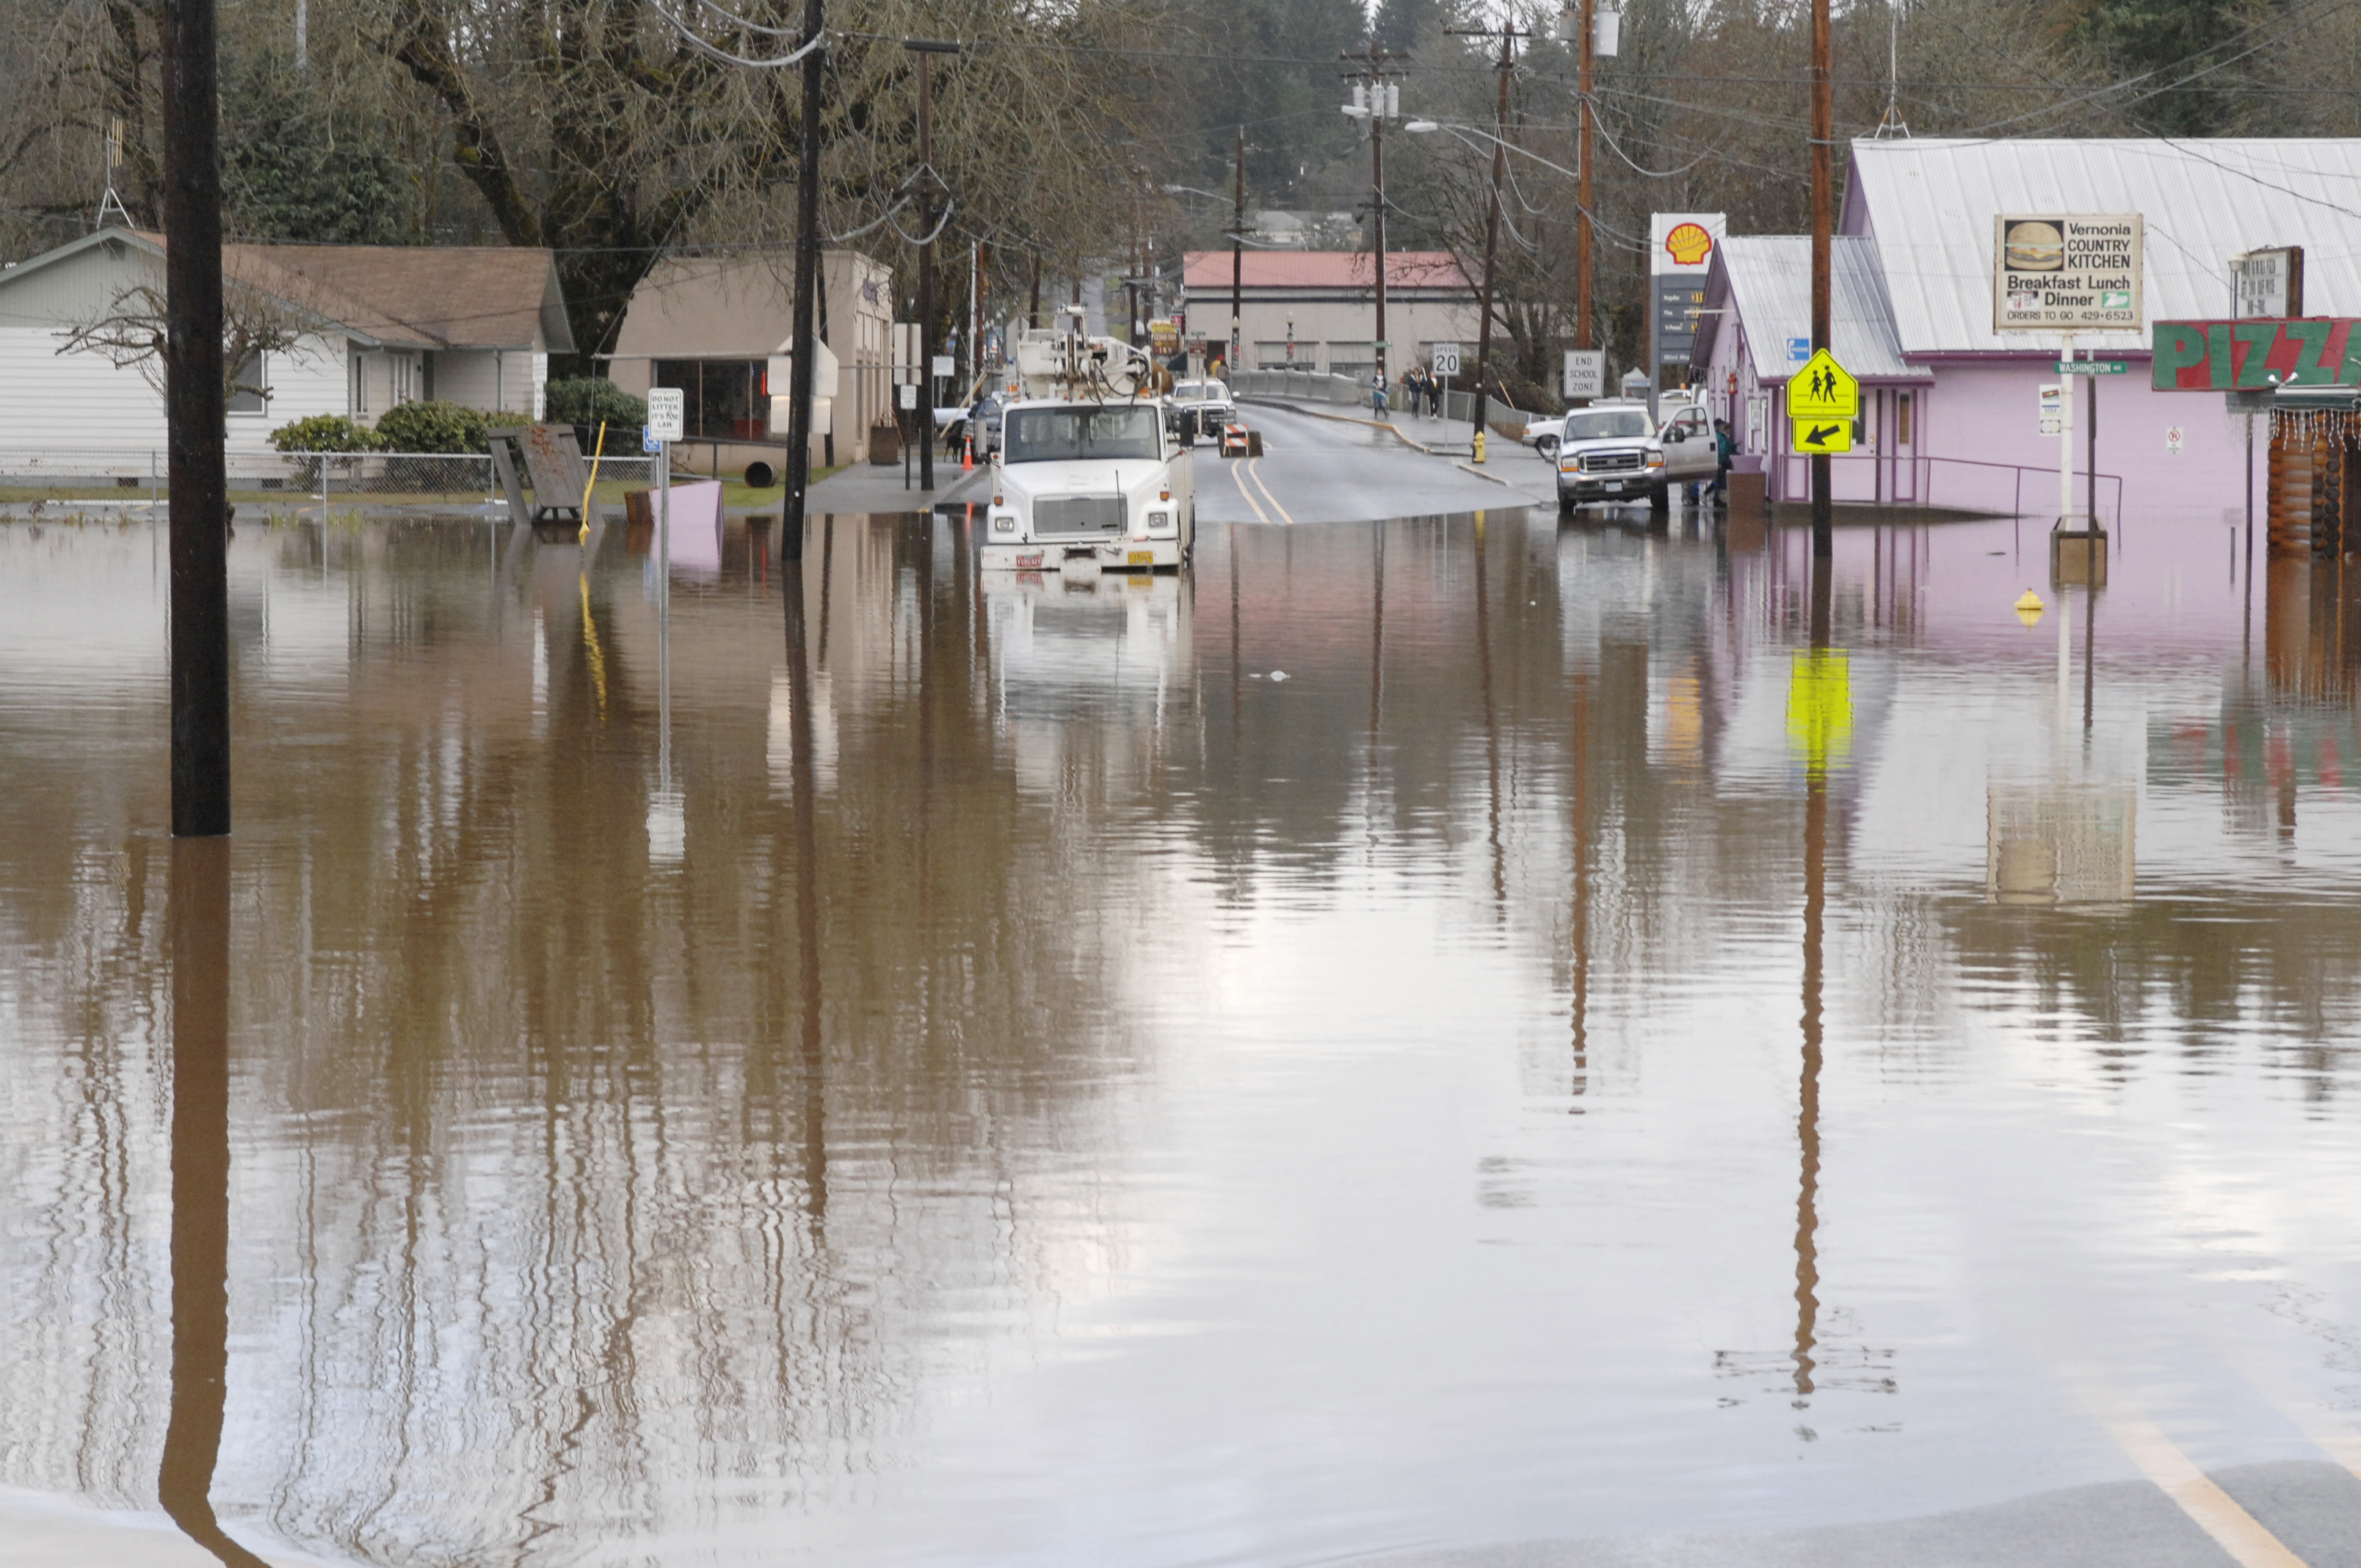 File Vernonia Oregon Flooding Dec 12 Jpg Wikimedia Commons